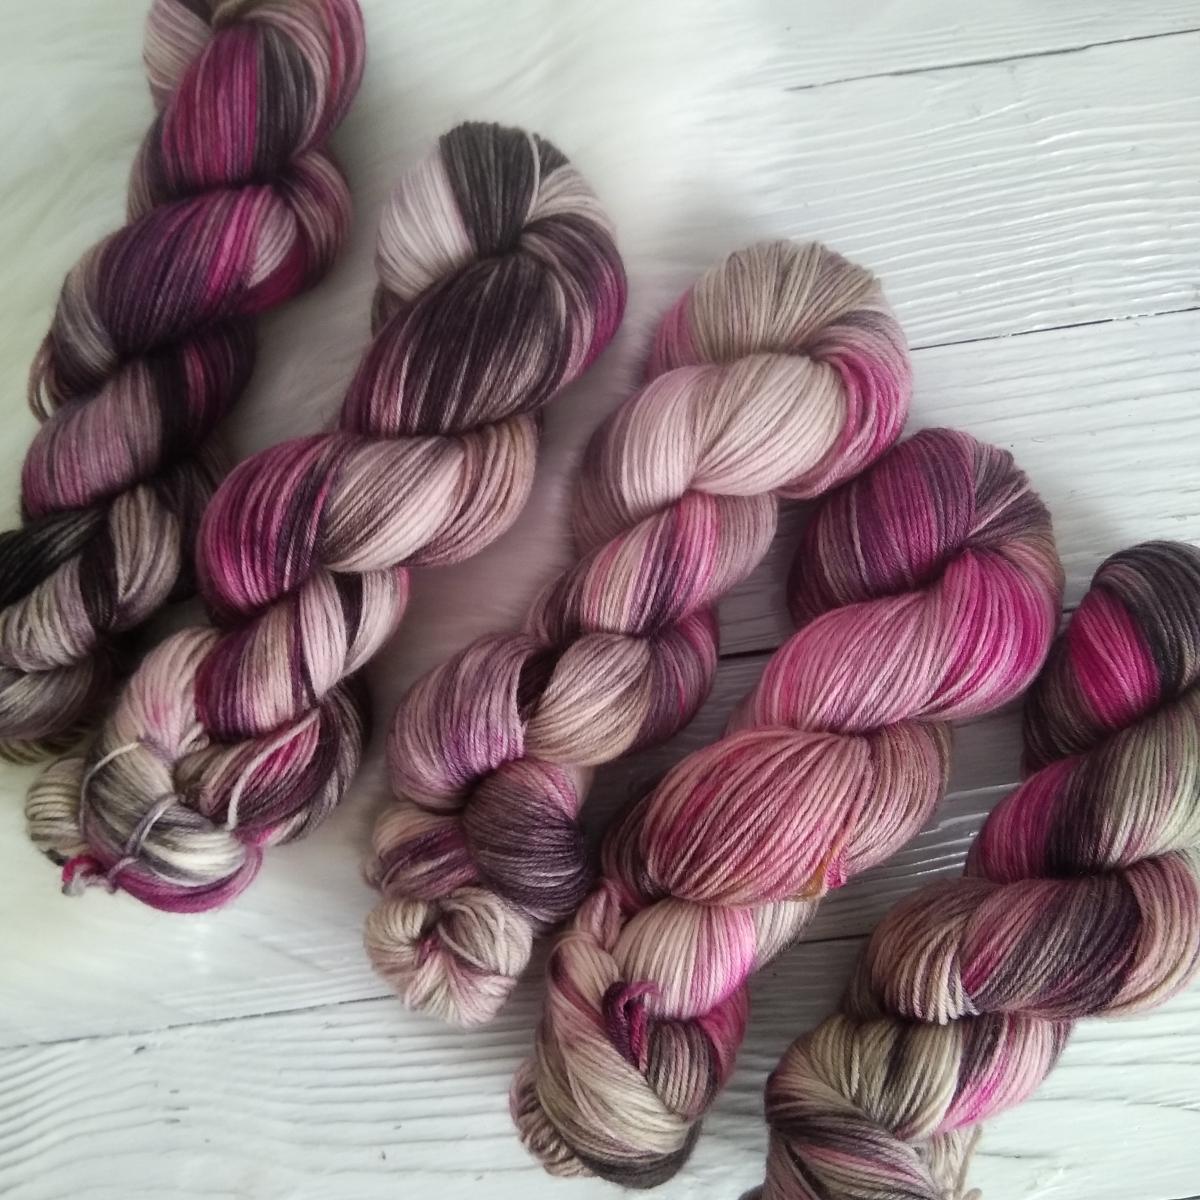 woodico.pro hand dyed yarn 037 7 1200x1200 - Hand dyed yarn / 037